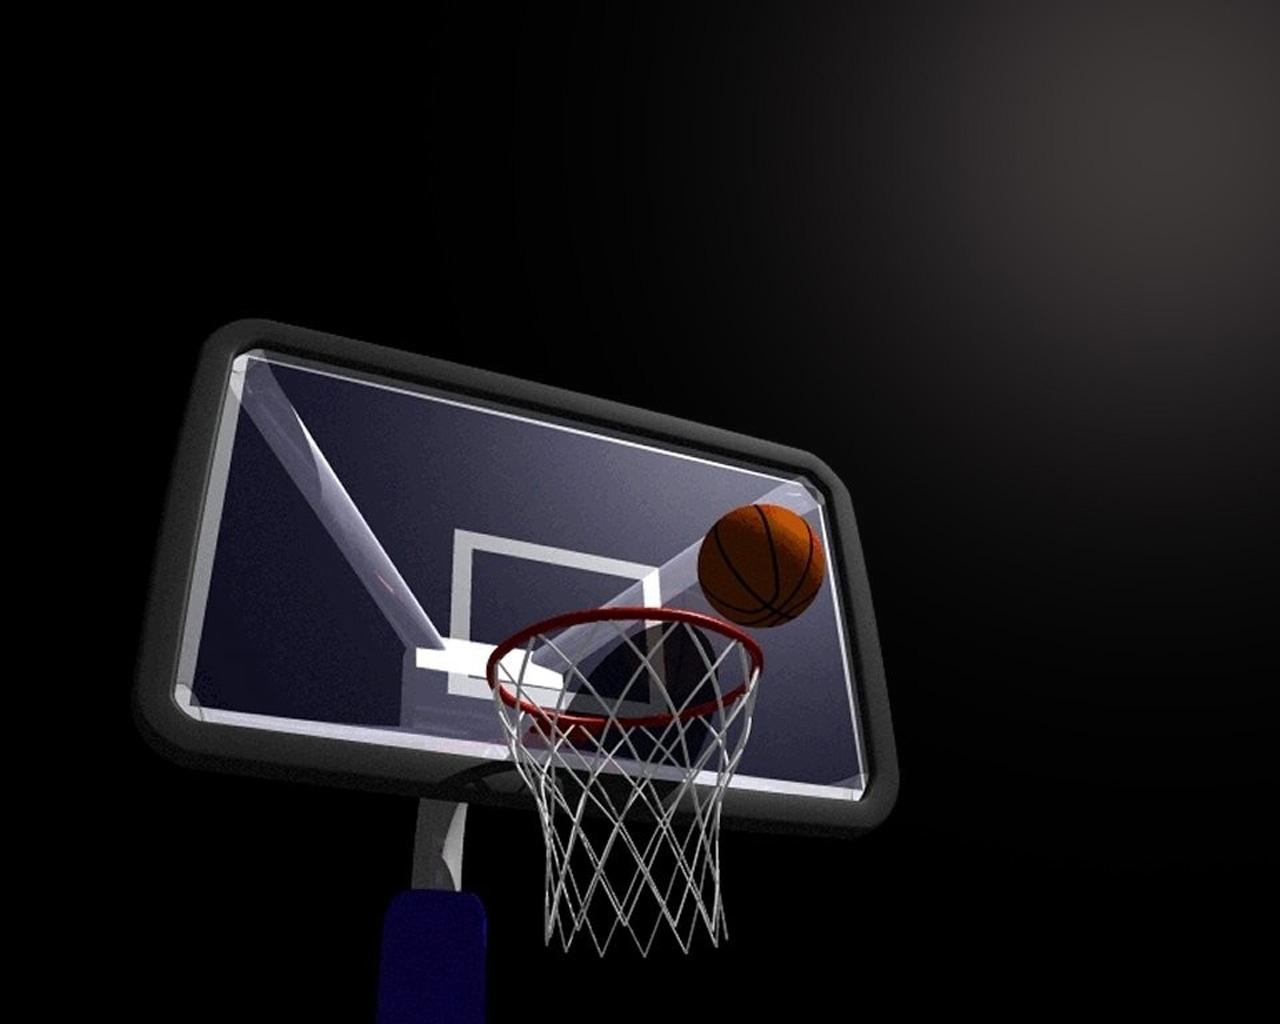 Cool 3d wallpaper hd basketball wallpapersafari - Cool basketball wallpapers hd ...